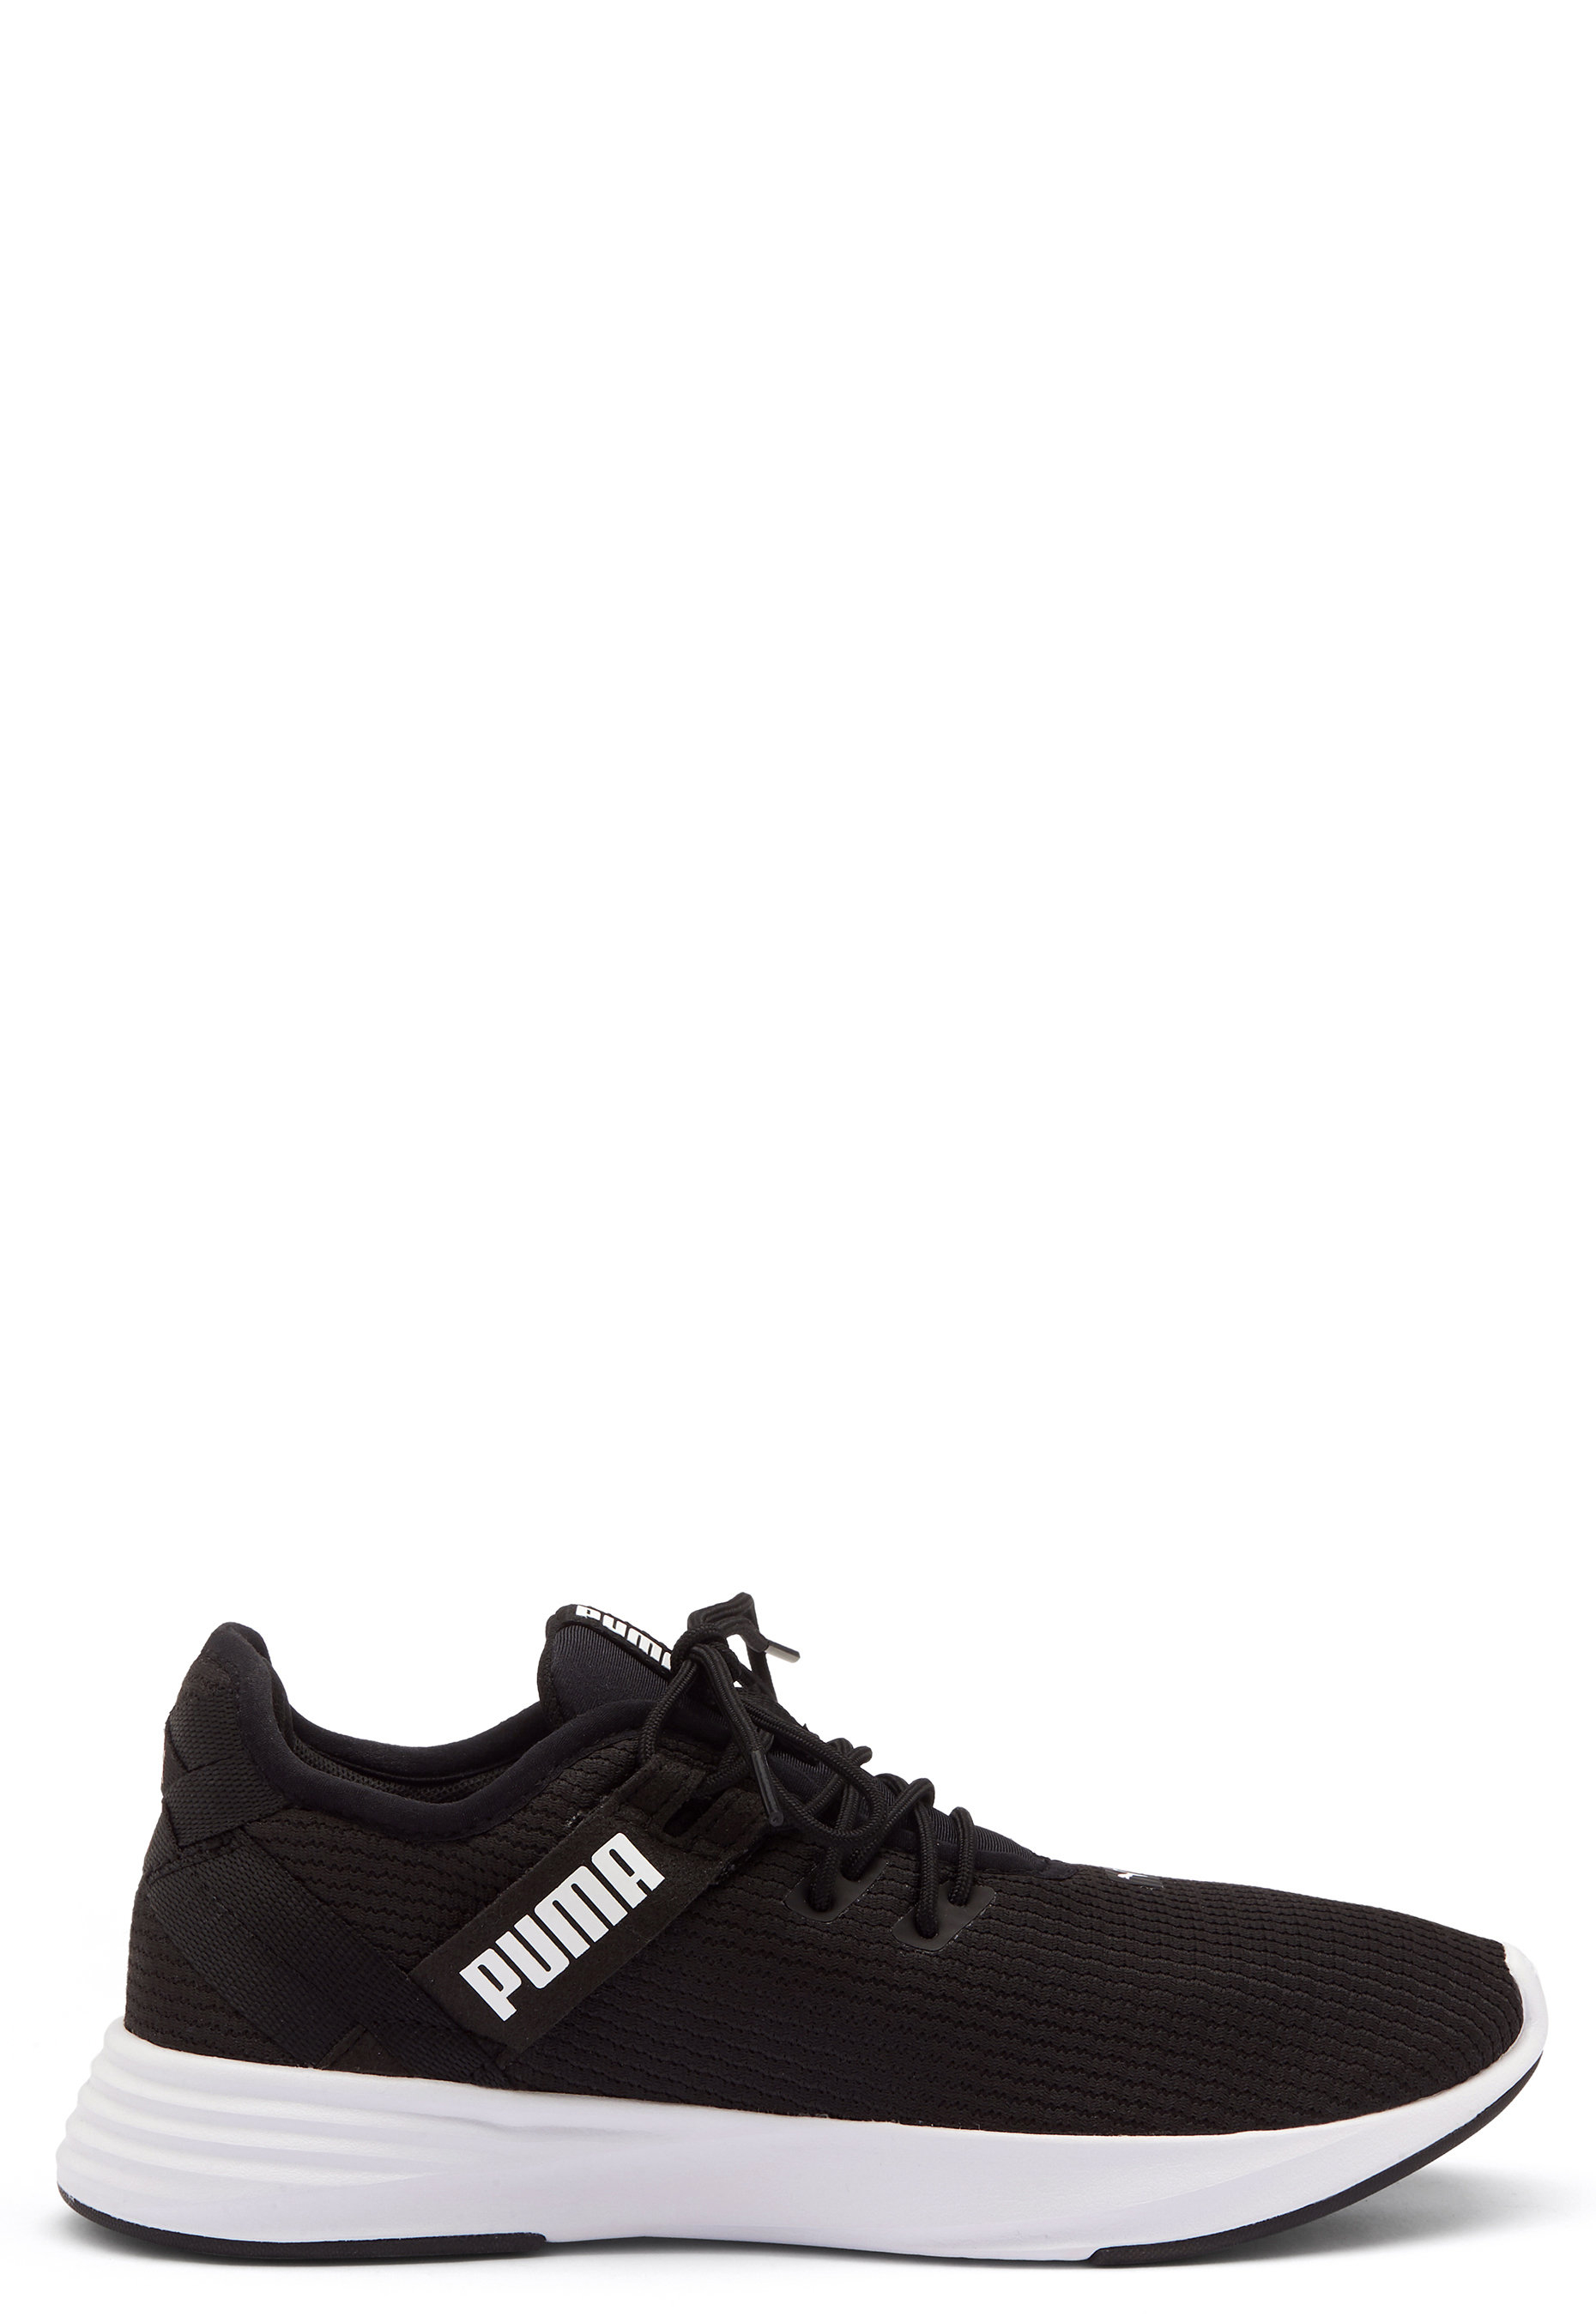 c38d5e08cd4 PUMA Radiate XT Sneakers 001 Black - Bubbleroom